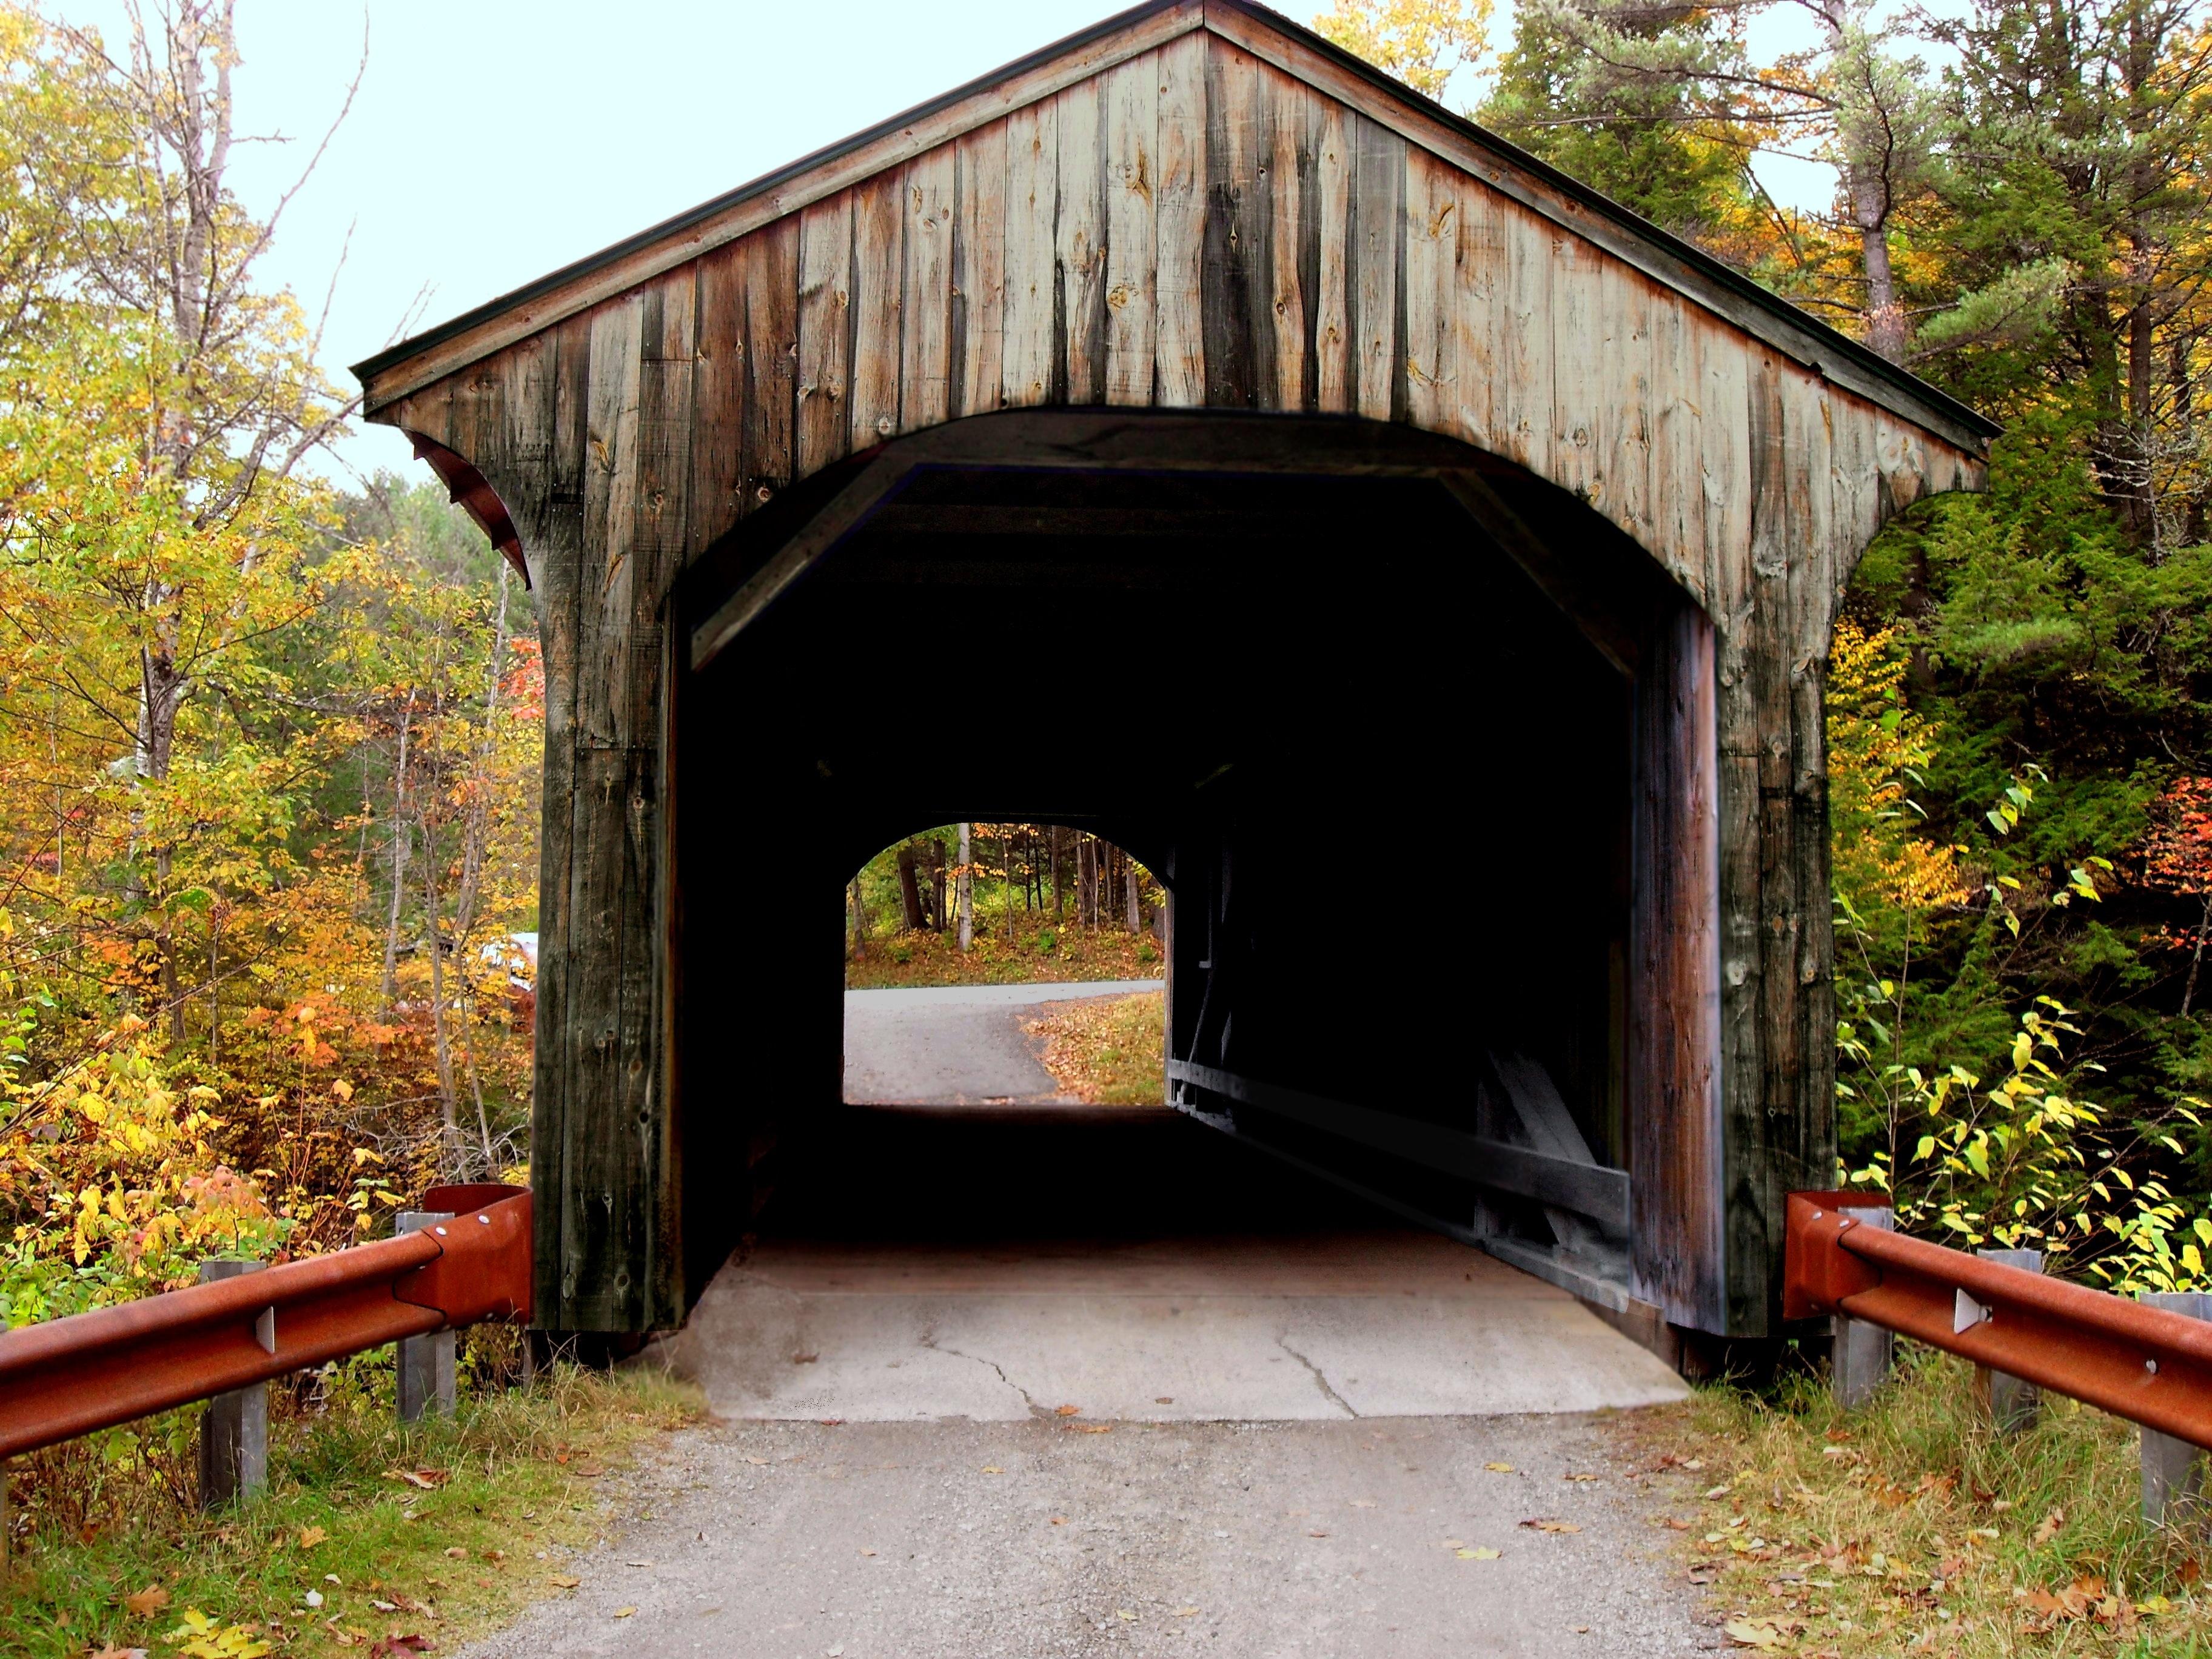 Fotos gratis : arquitectura, estructura, puente, campo, cruce, casa ...